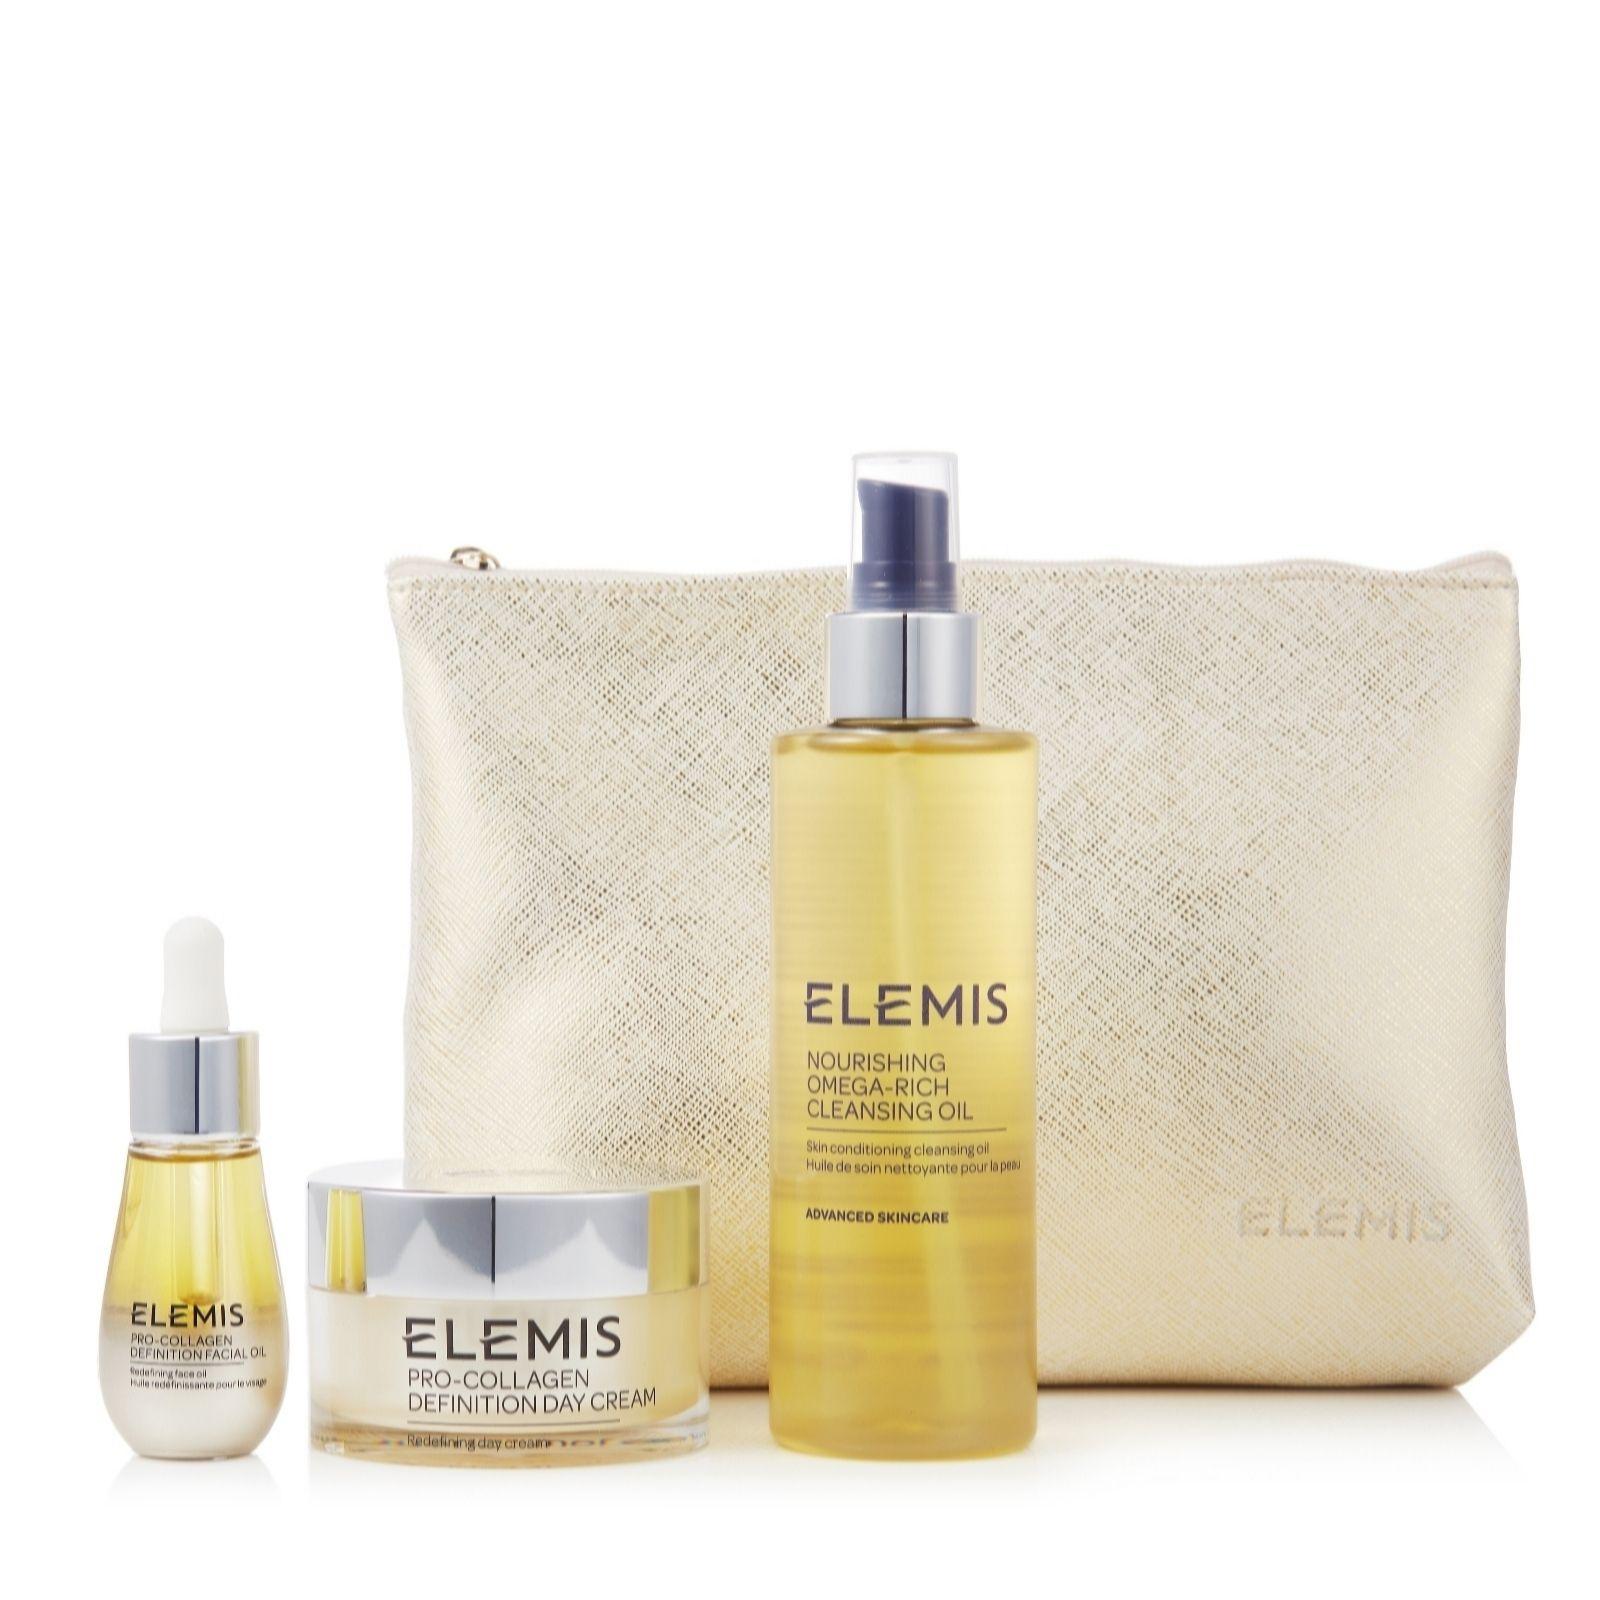 Elemis Pro-Collagen Definition 3 Piece Essentials Collection - £66.96 + £3.95 del at QVC